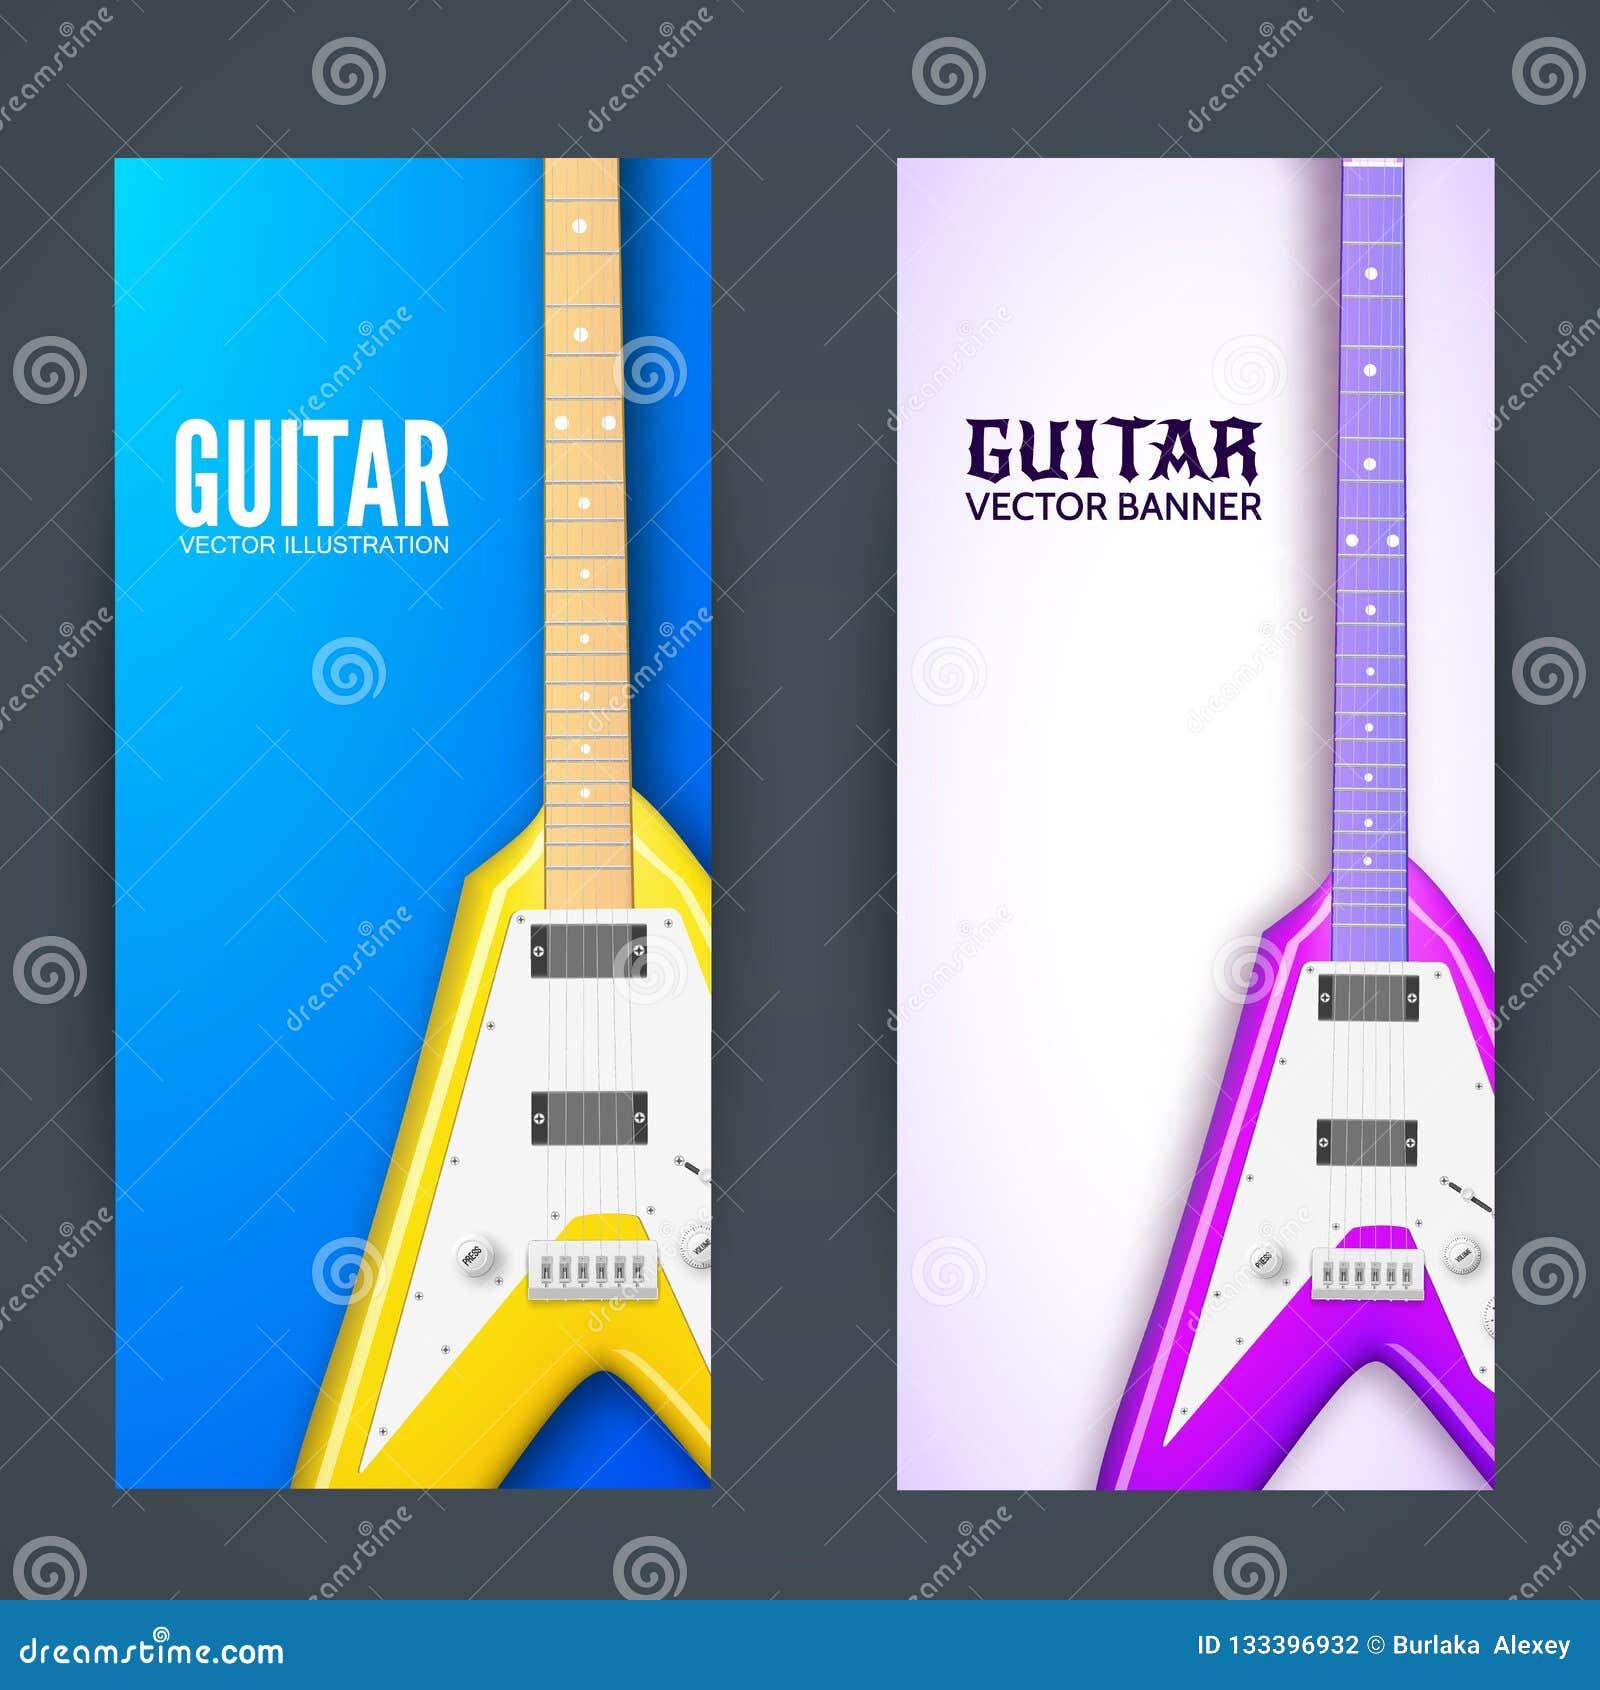 Guitar Banner Background Concept Vector Illustration Design Stock Illustration Illustration Of Music Header 133396932